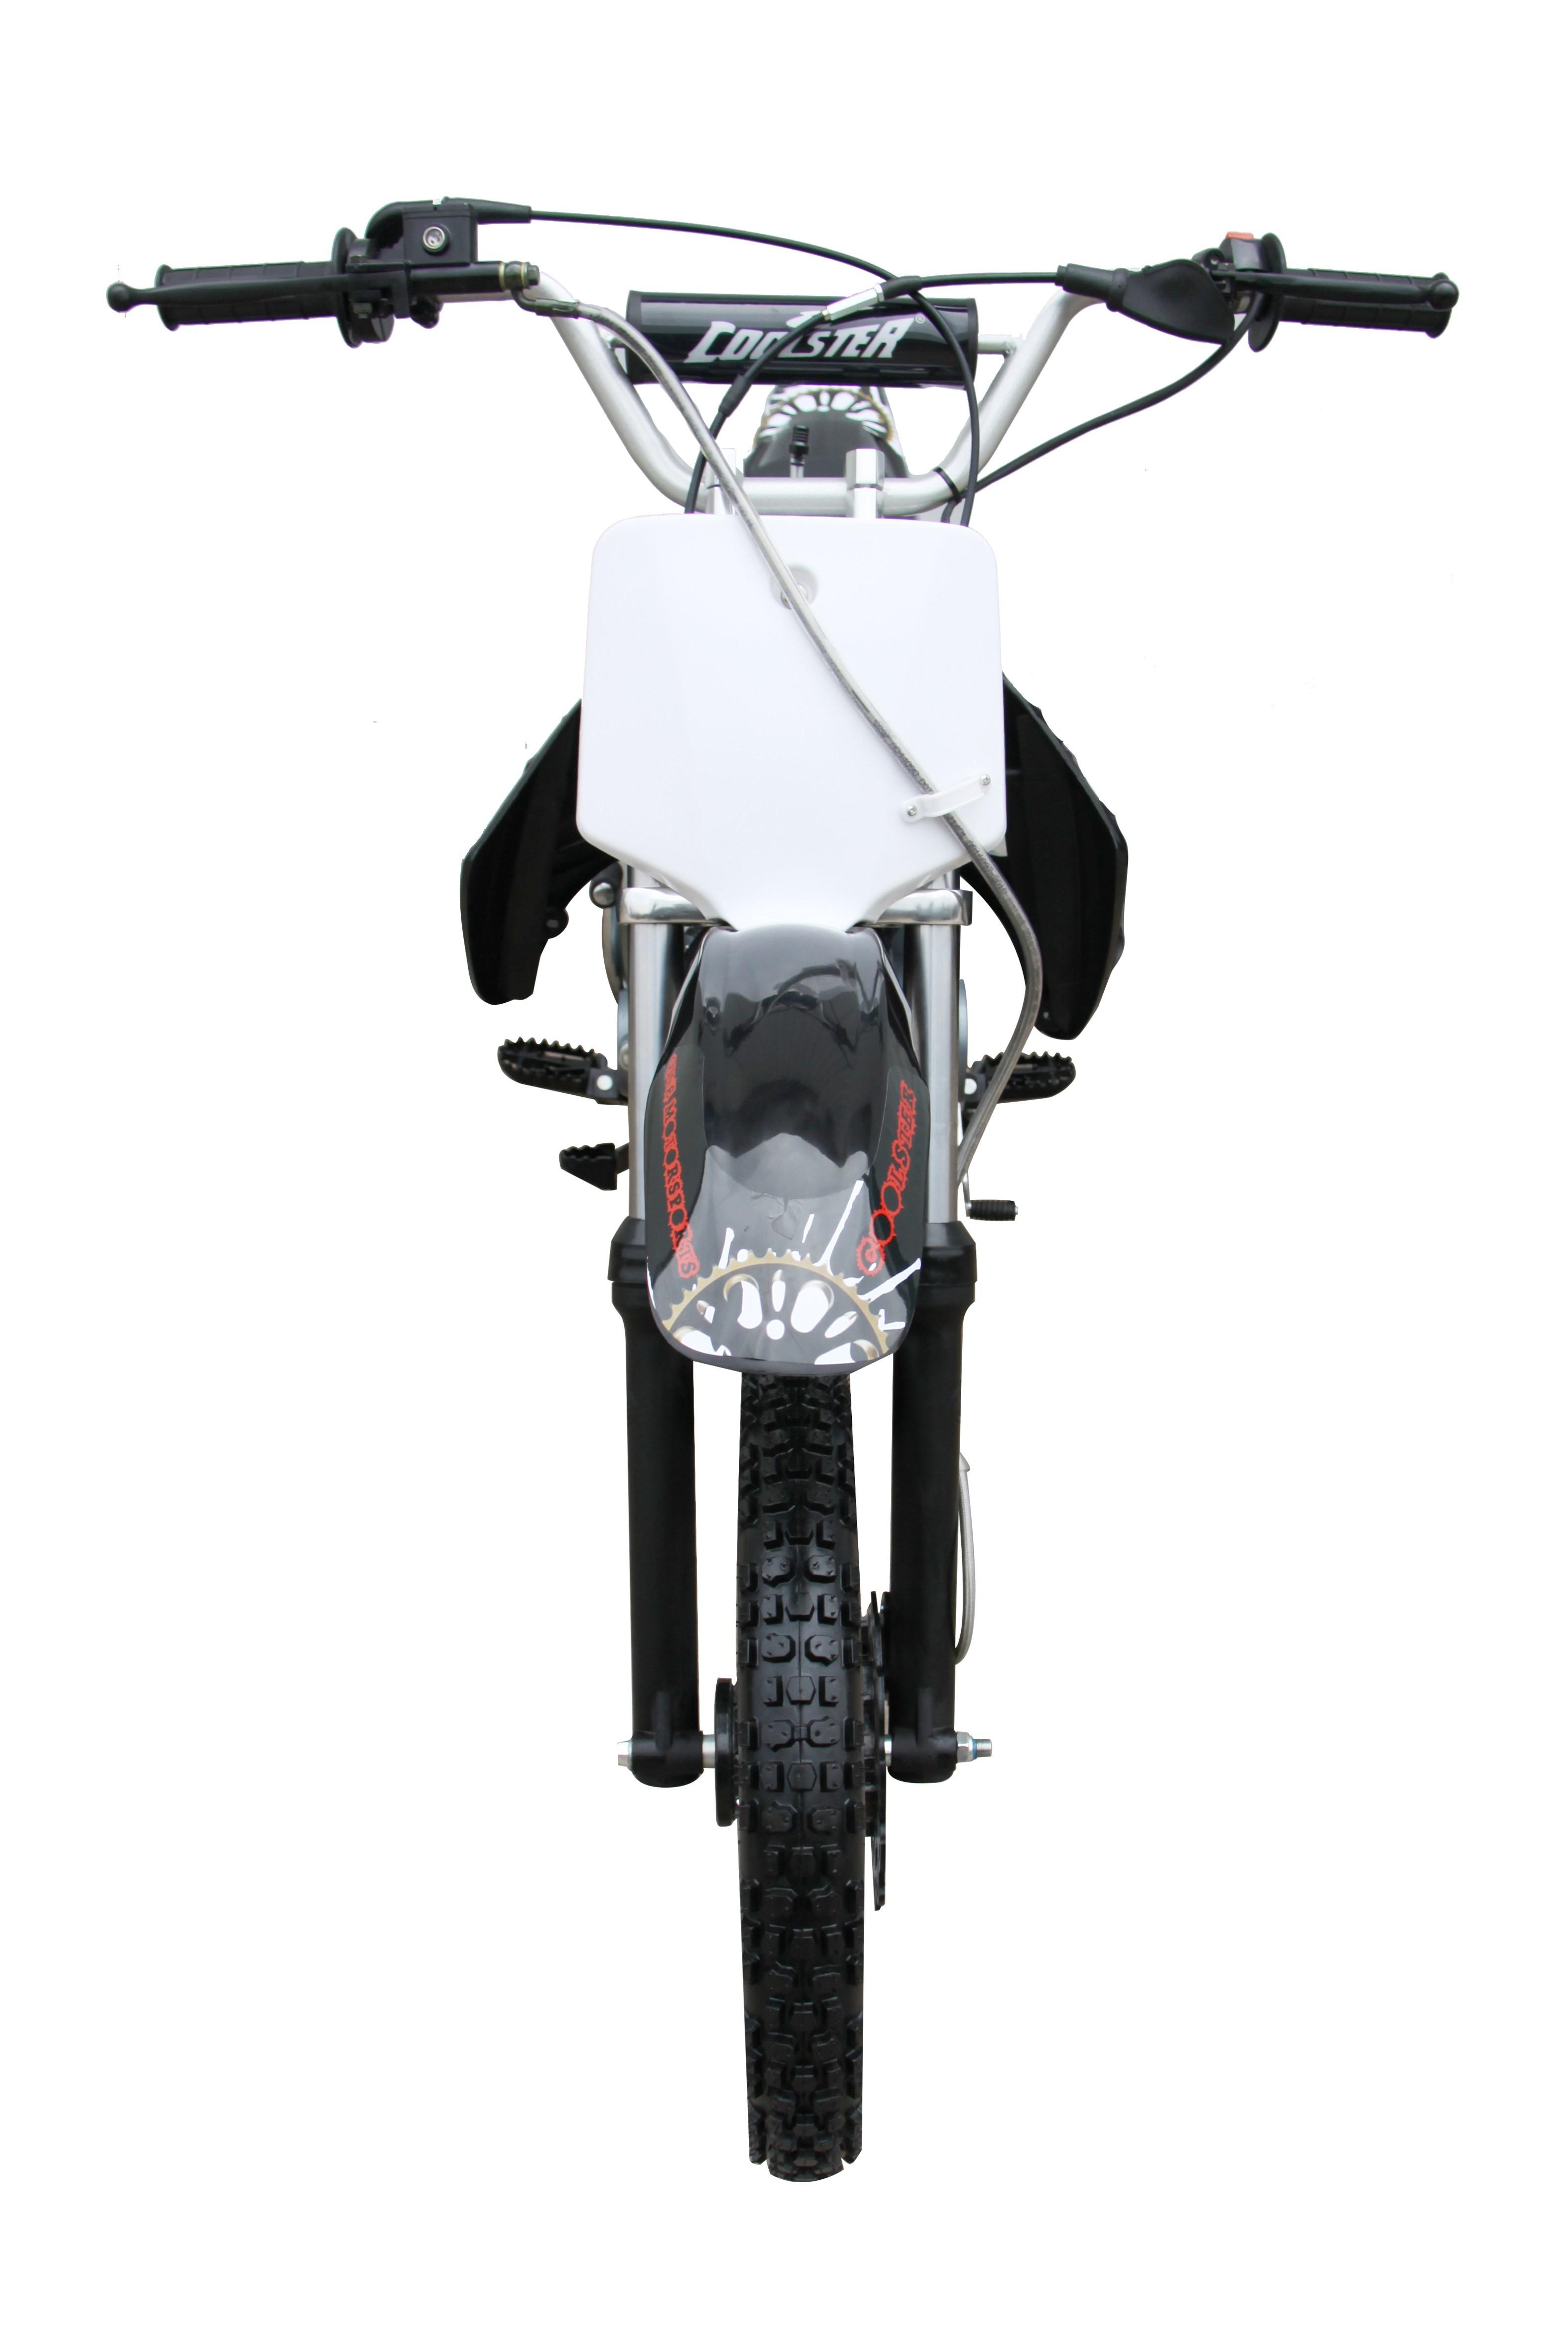 Coolster 125cc 214 FC Dirt Bike